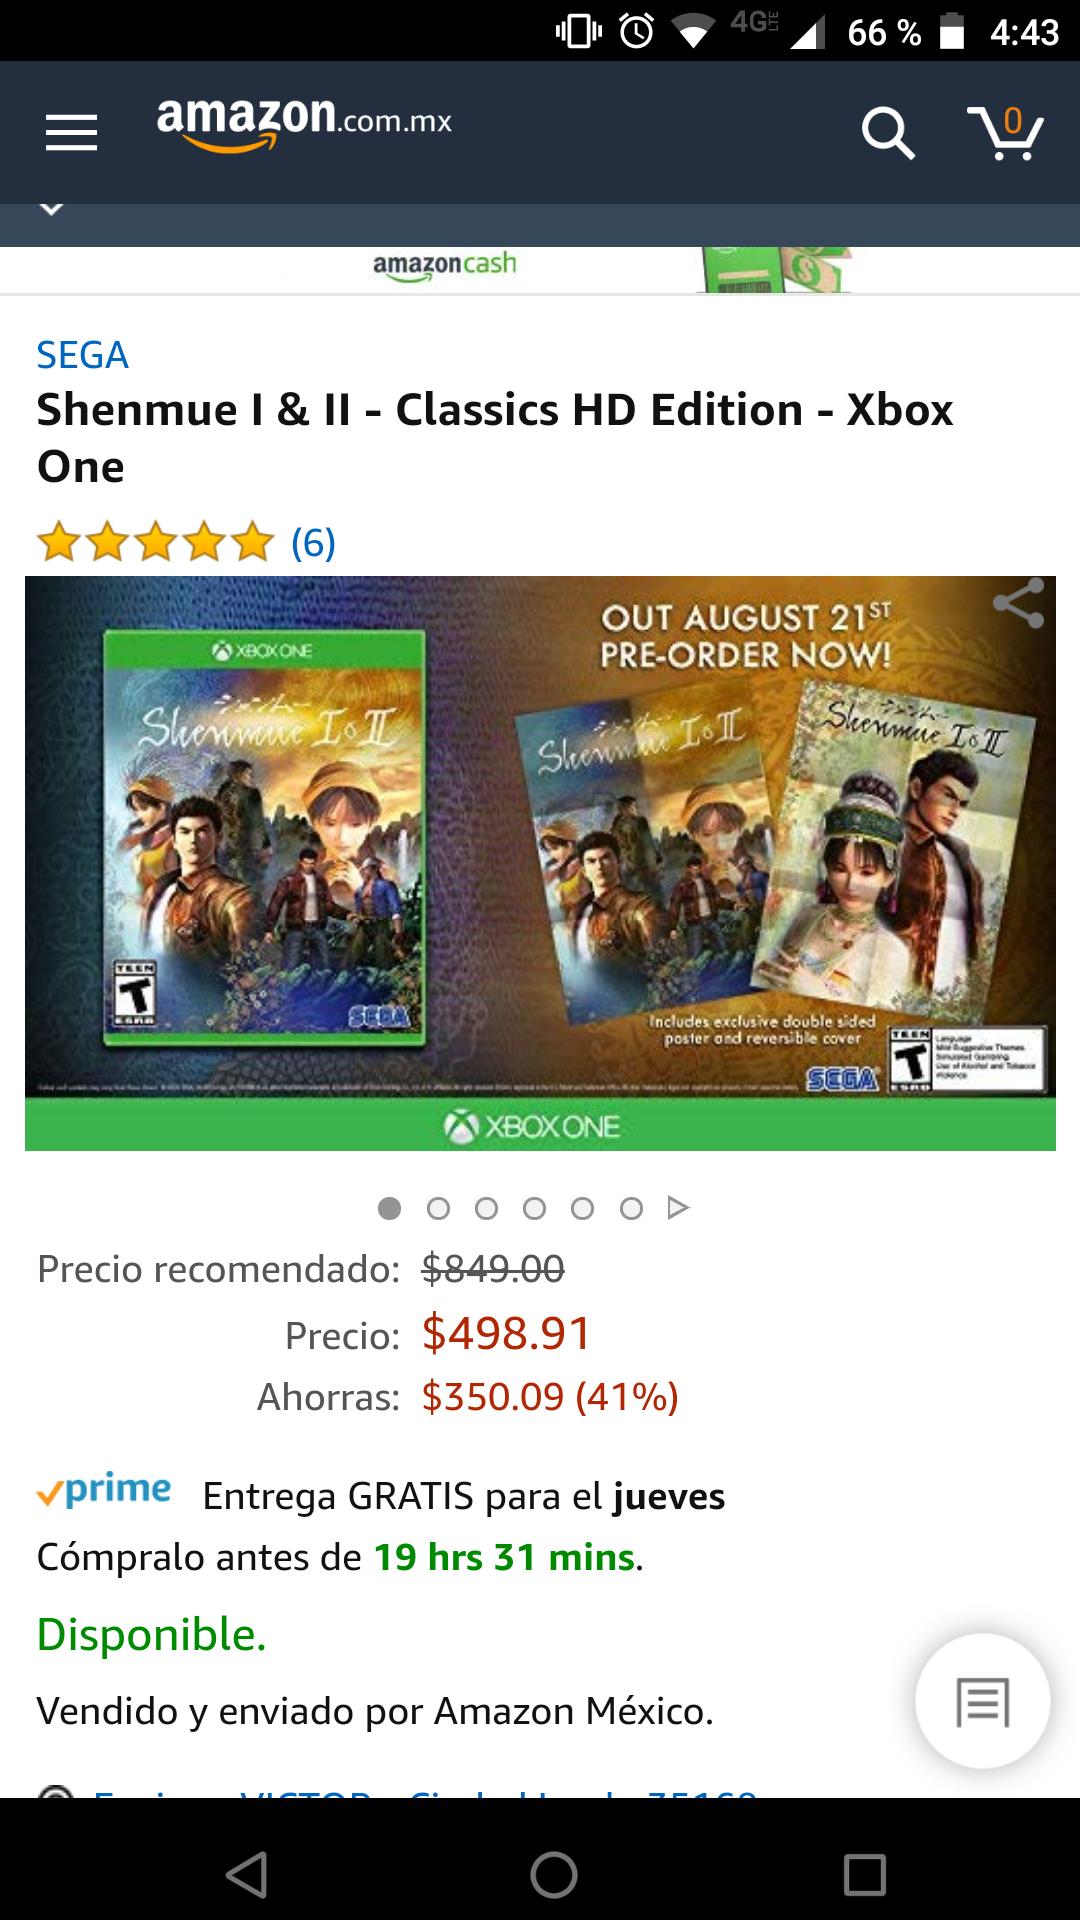 Amazon: Shenmue I & II - Classics HD Edition - Xbox One